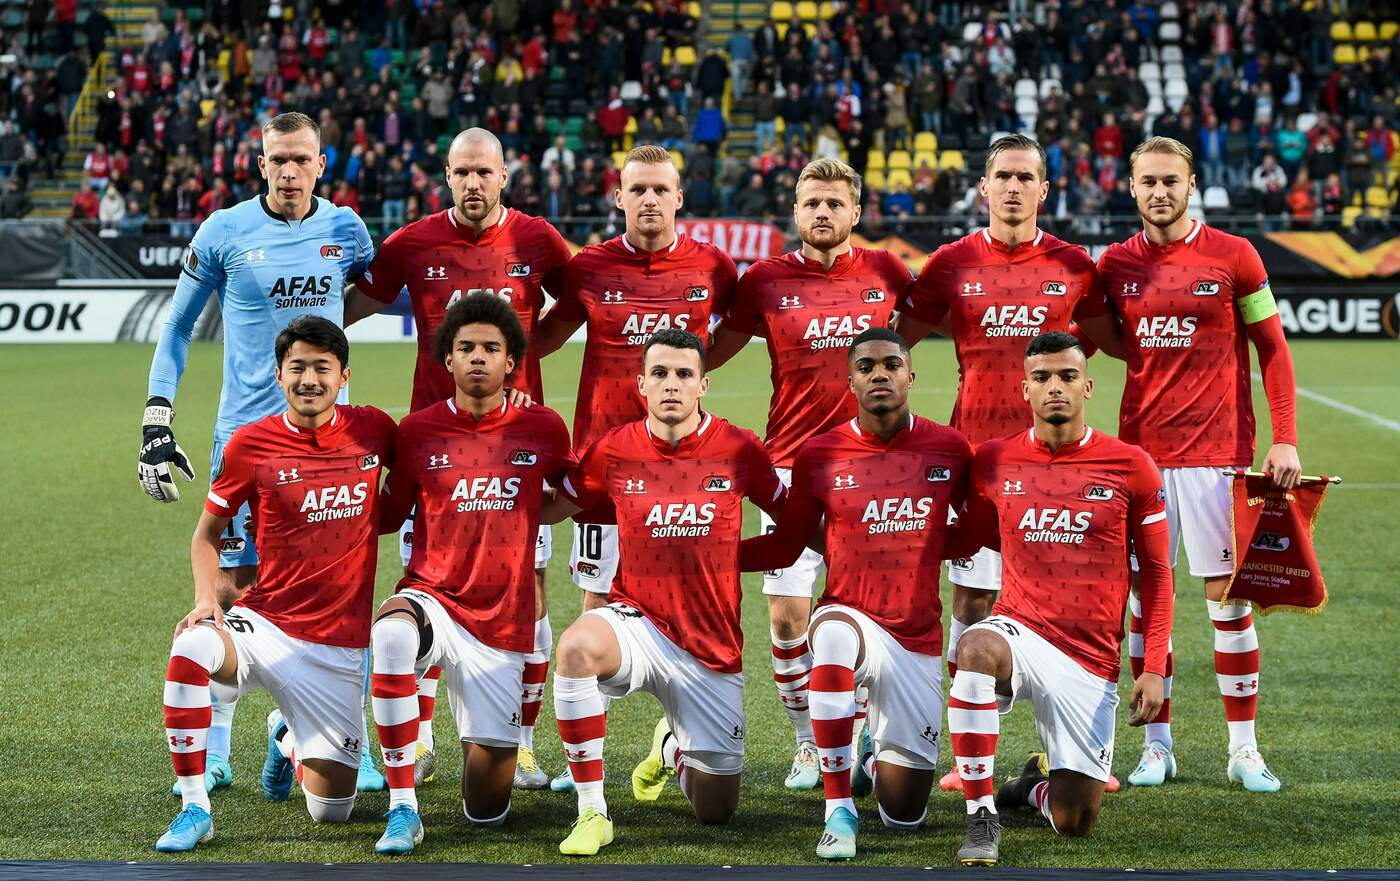 Pronostico Heerenveen-Alkmaar 25 gennaio: le quote di Eredivisie